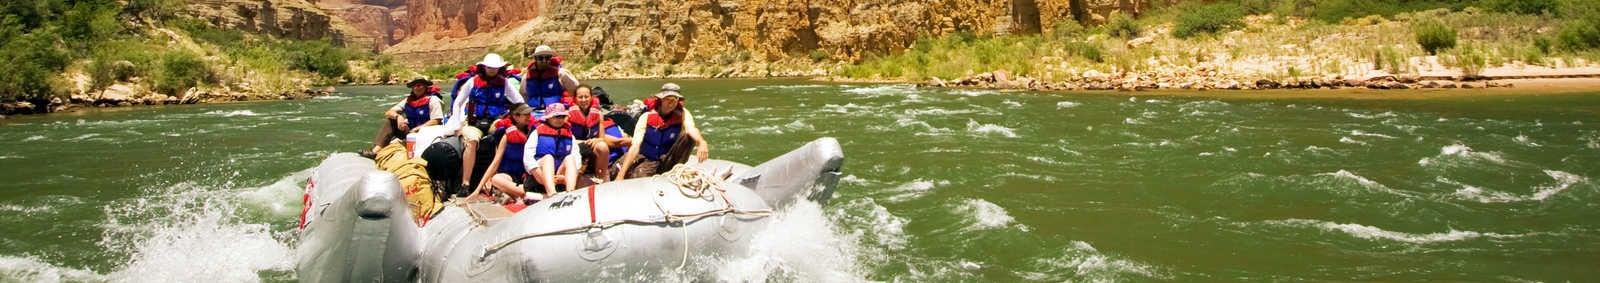 Rafting down the Colorado River, Grand Canyon, USA